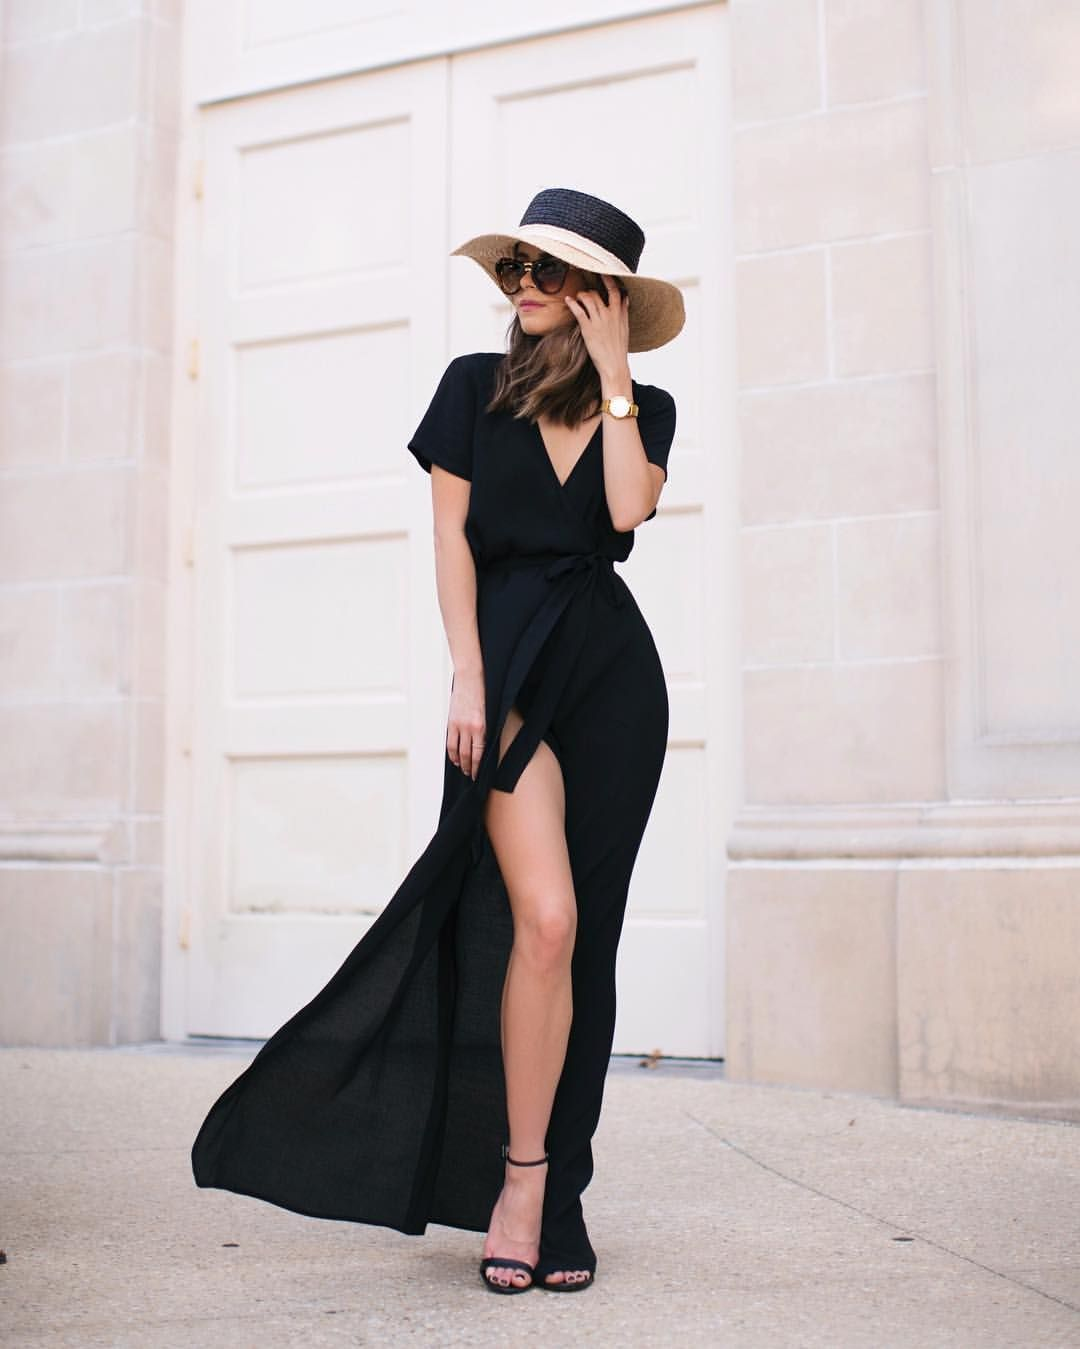 Pin by jenaca holmes on style inspirations aspirations pinterest